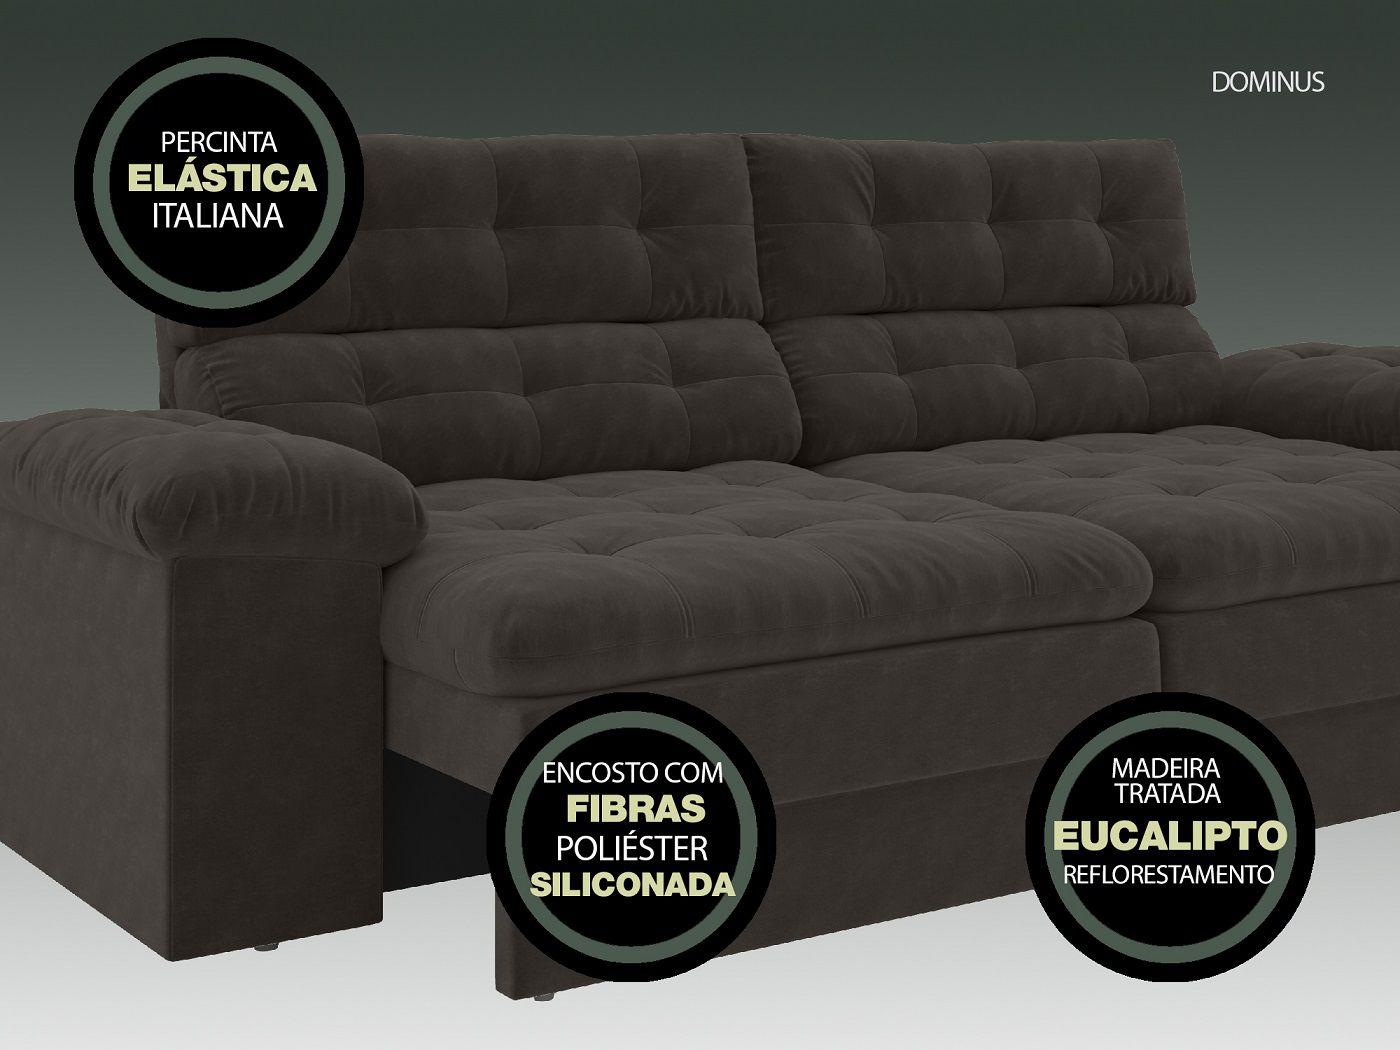 Sofá 4 Lugares Net Dominus Assento Retrátil e Reclinável Chocolate 2,20m (L)